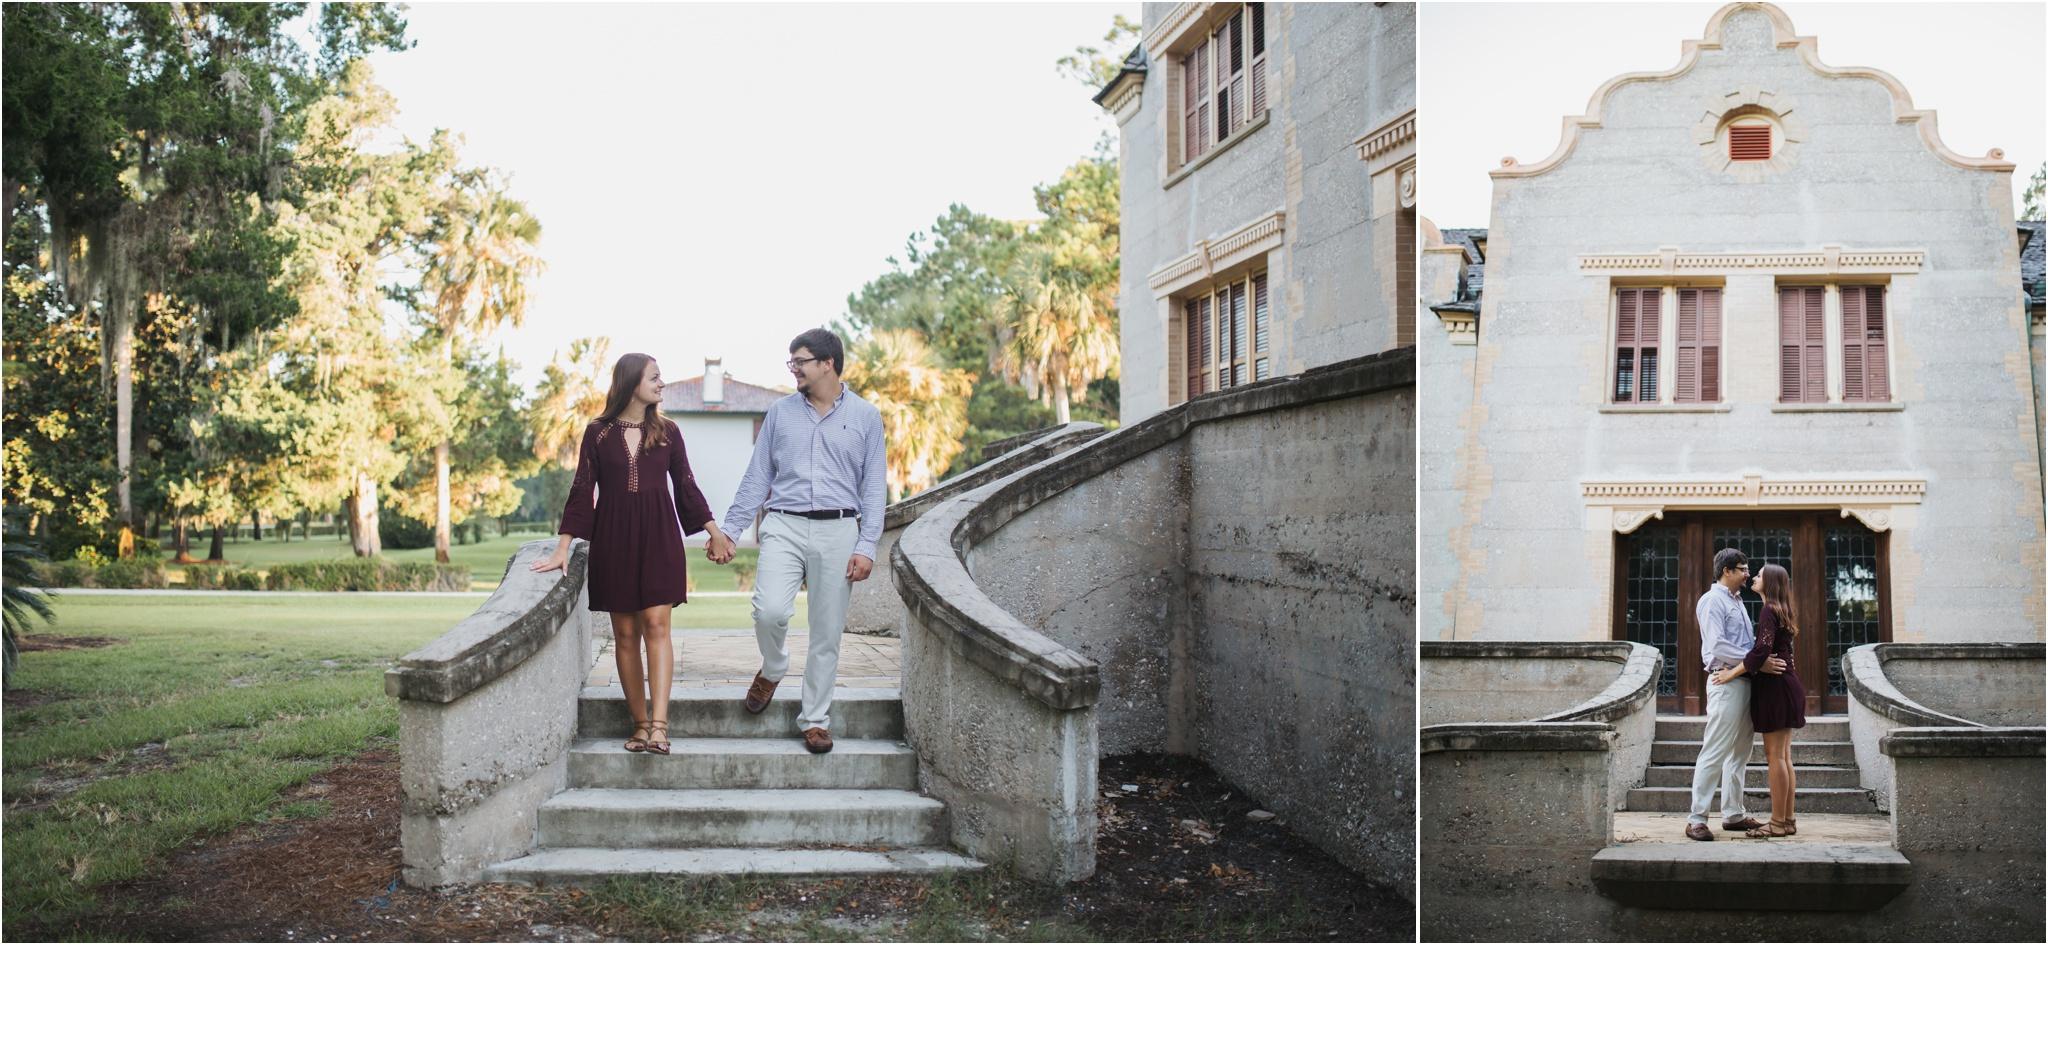 Rainey_Gregg_Photography_St._Simons_Island_Georgia_California_Wedding_Portrait_Photography_1371.jpg